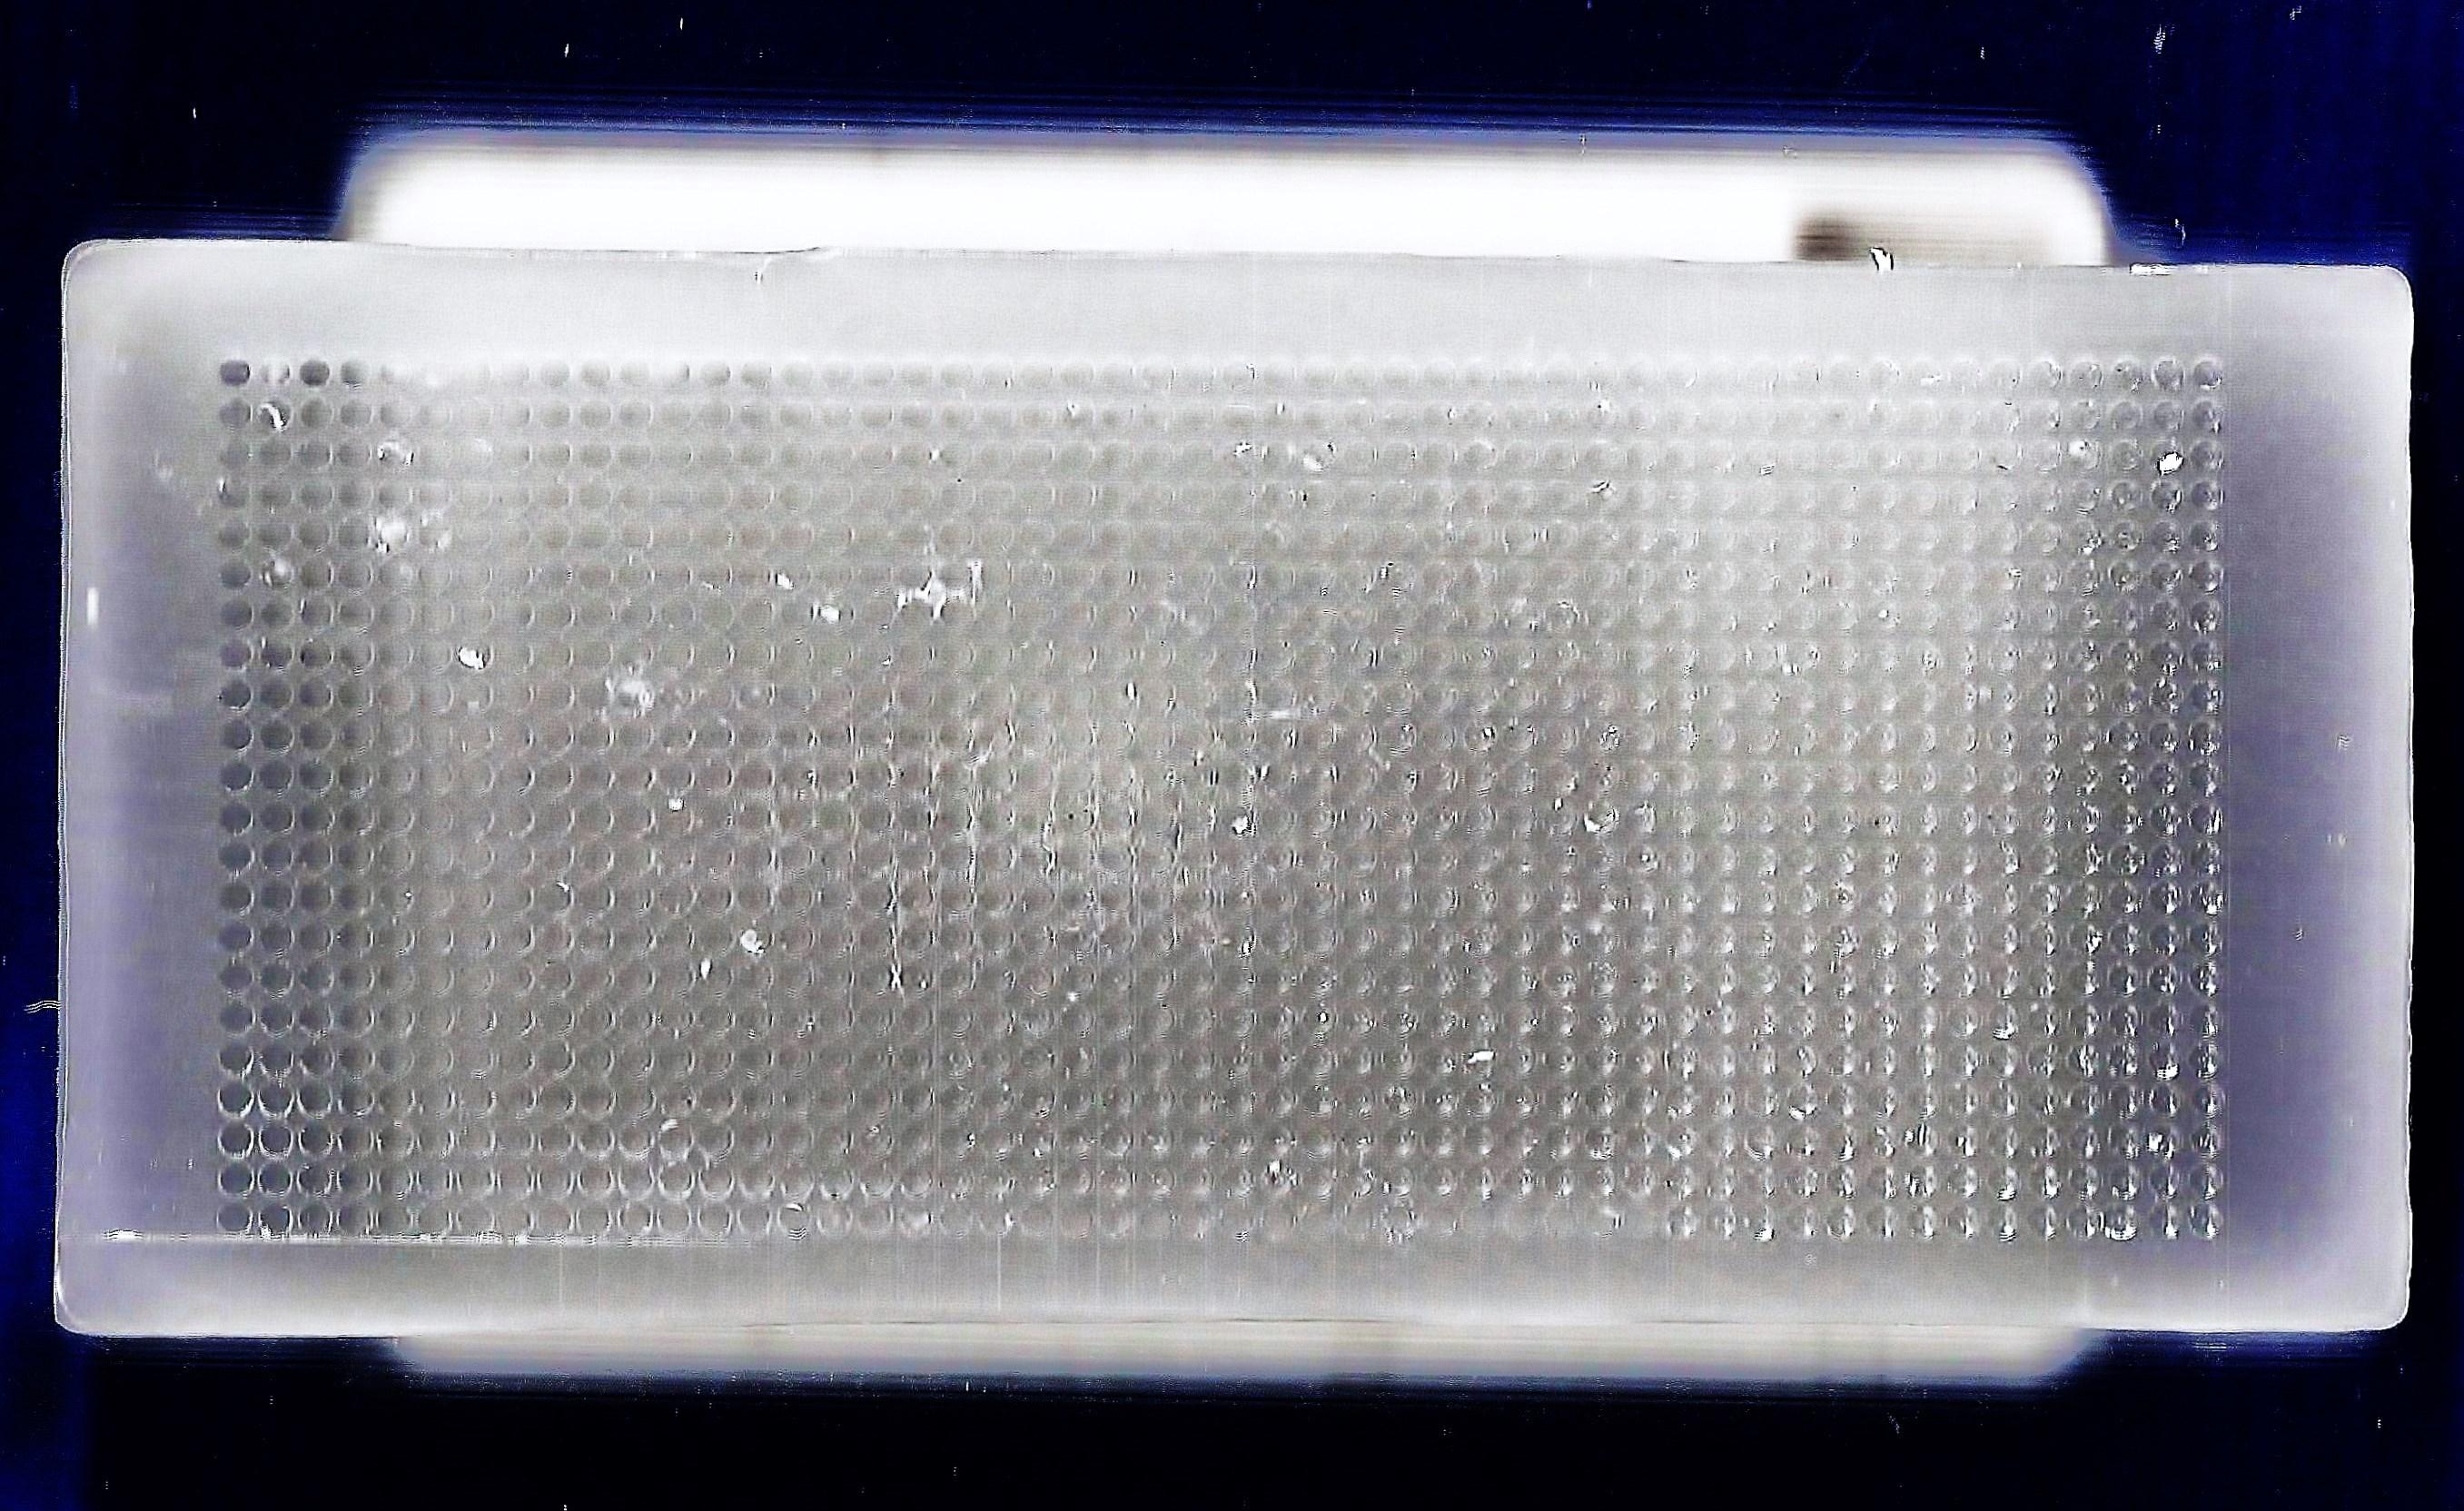 高密度组织芯片蜡块模(high density paraffin block)